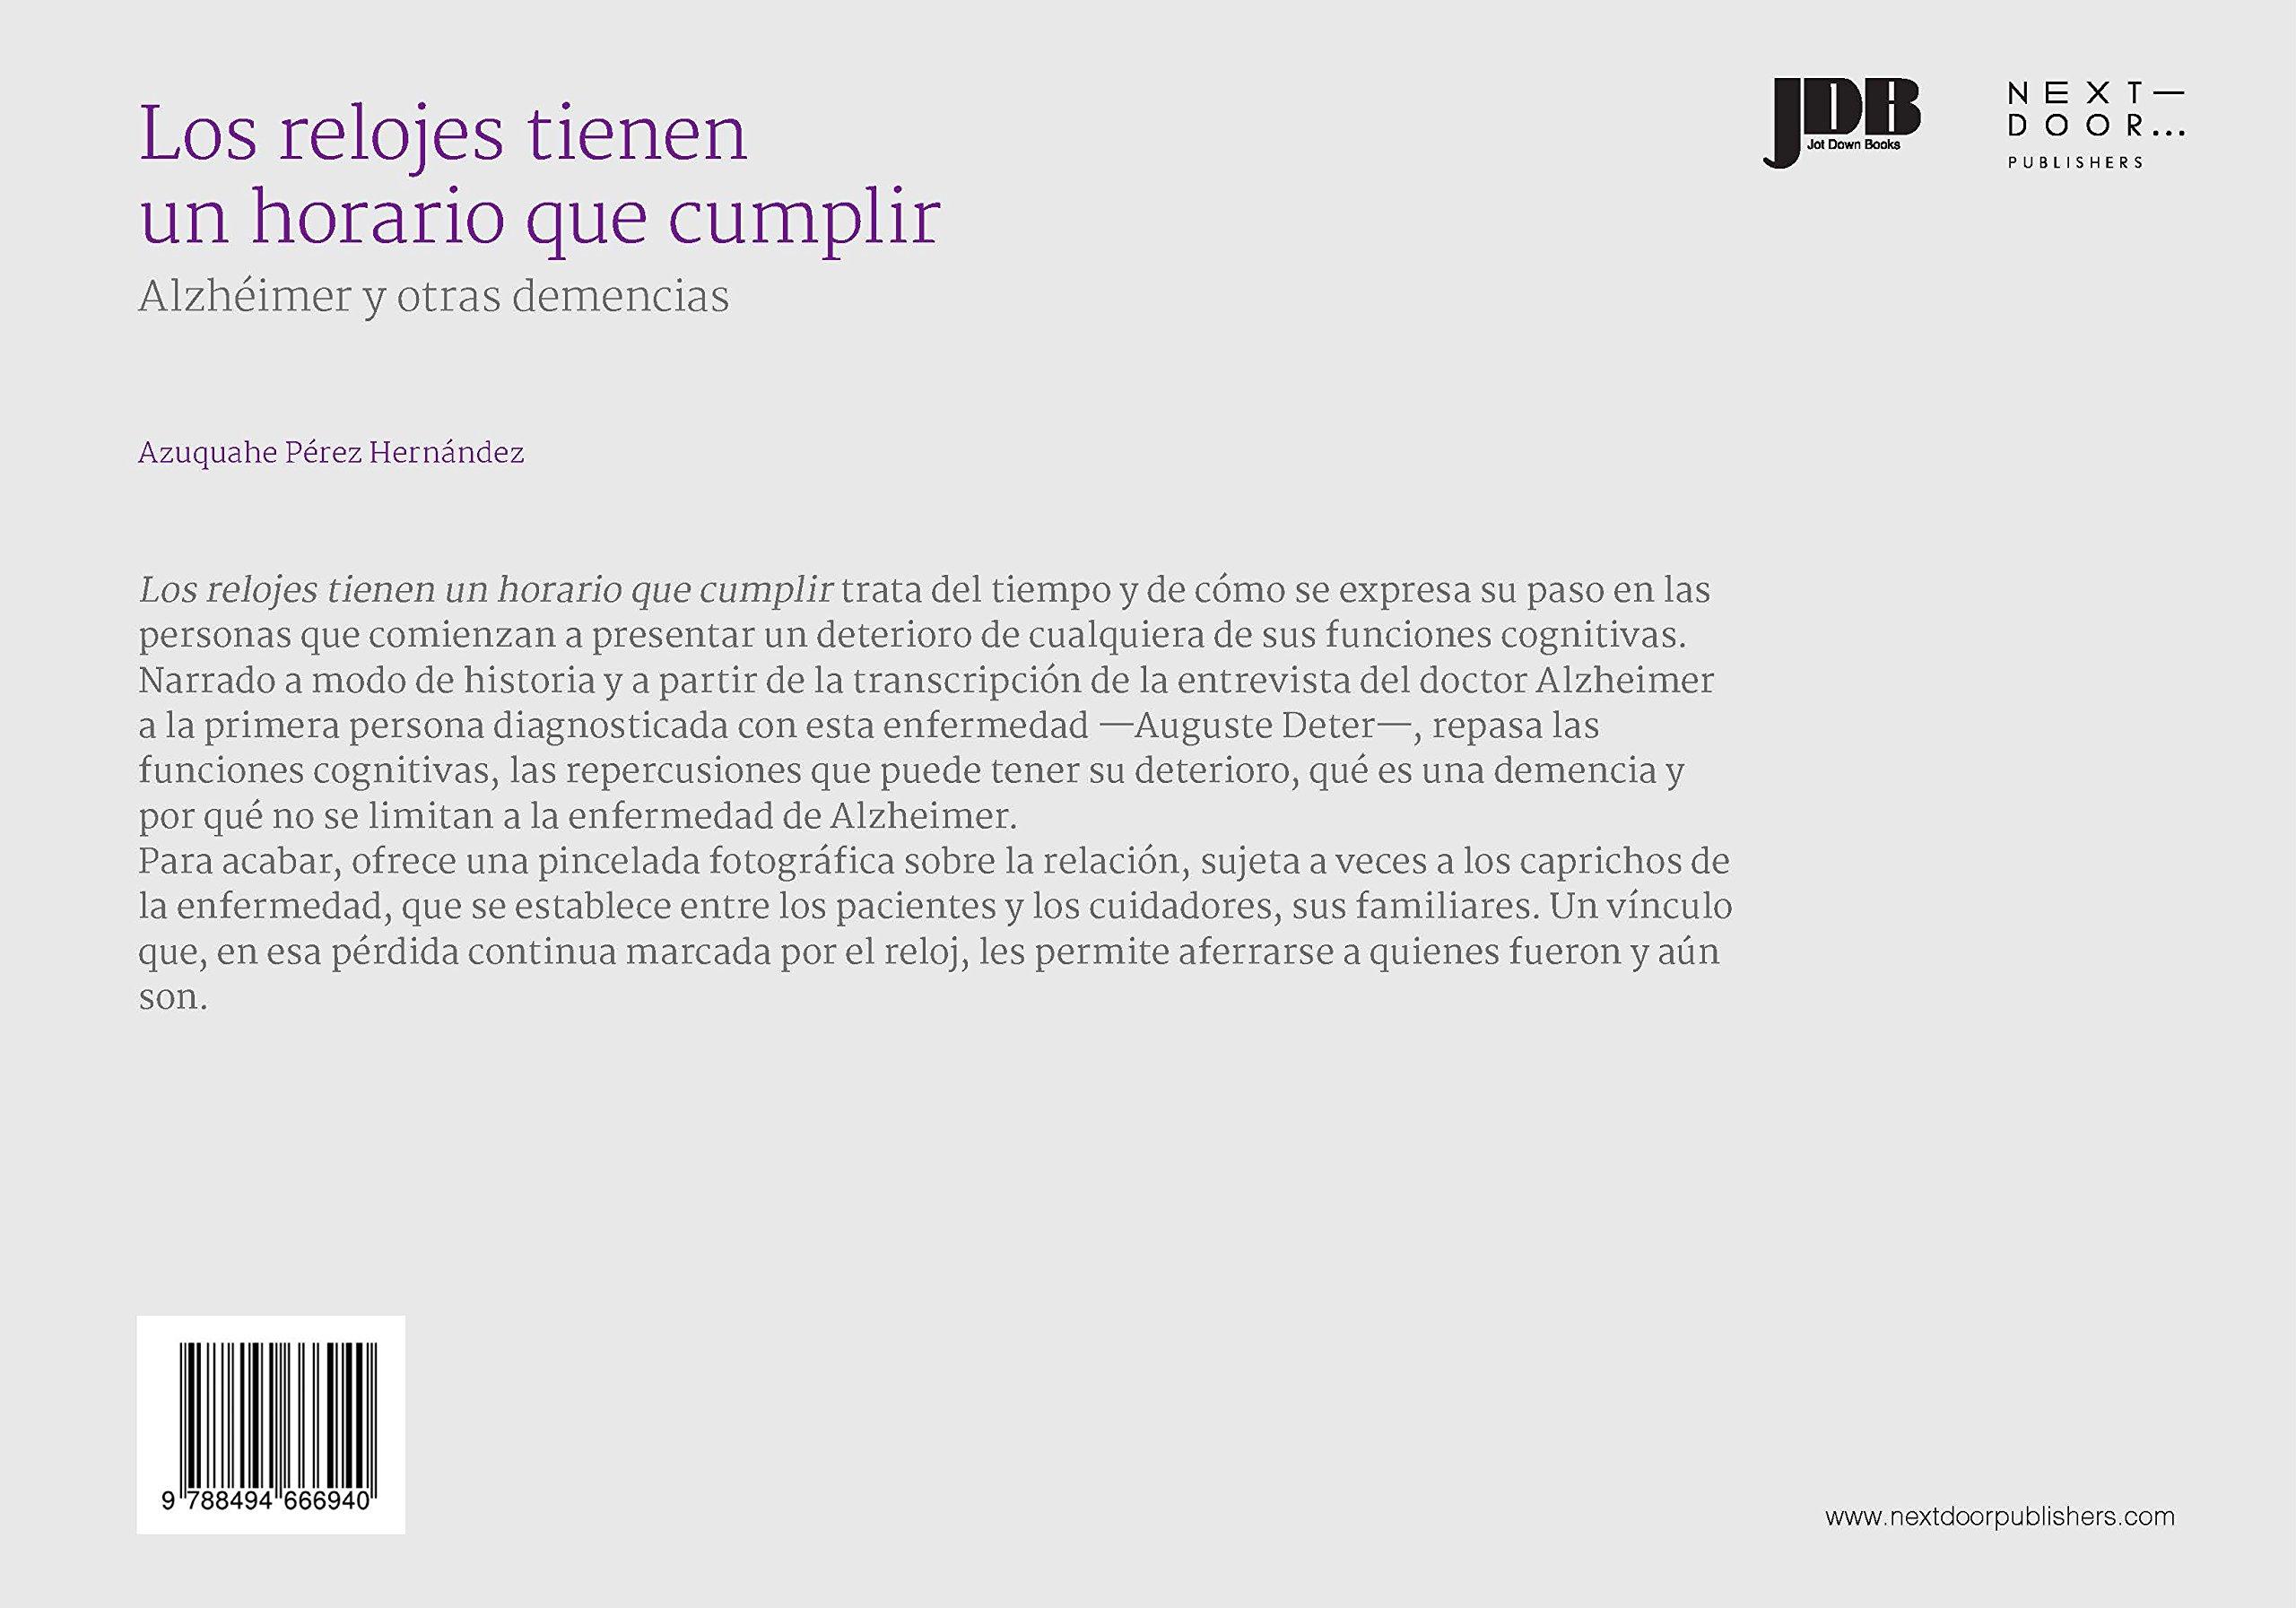 Los relojes tienen un horario que cumplir: Alzhéimer y otras demencias Lienzos y Matraces: Amazon.es: Azuquahe Pérez Hernández, Jot Down Books, ...